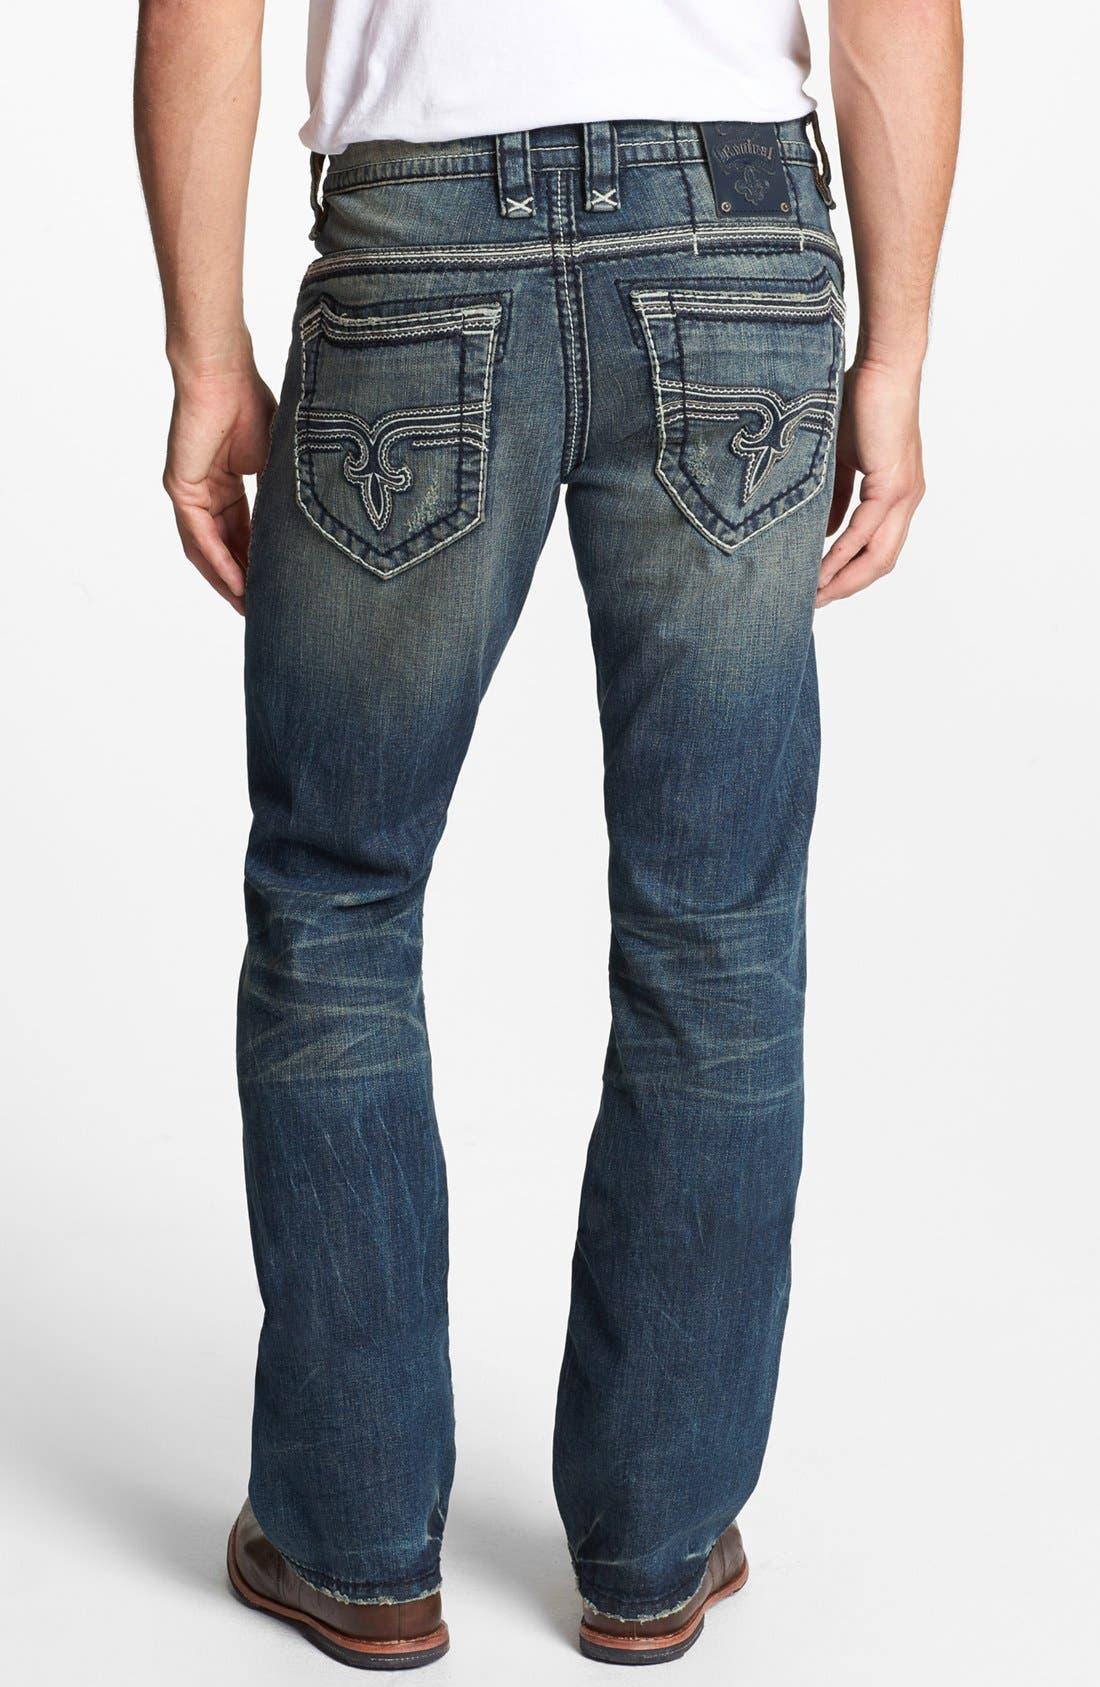 Alternate Image 1 Selected - Rock Revival 'Jonathan' Straight Leg Jeans (Vintage Blue)